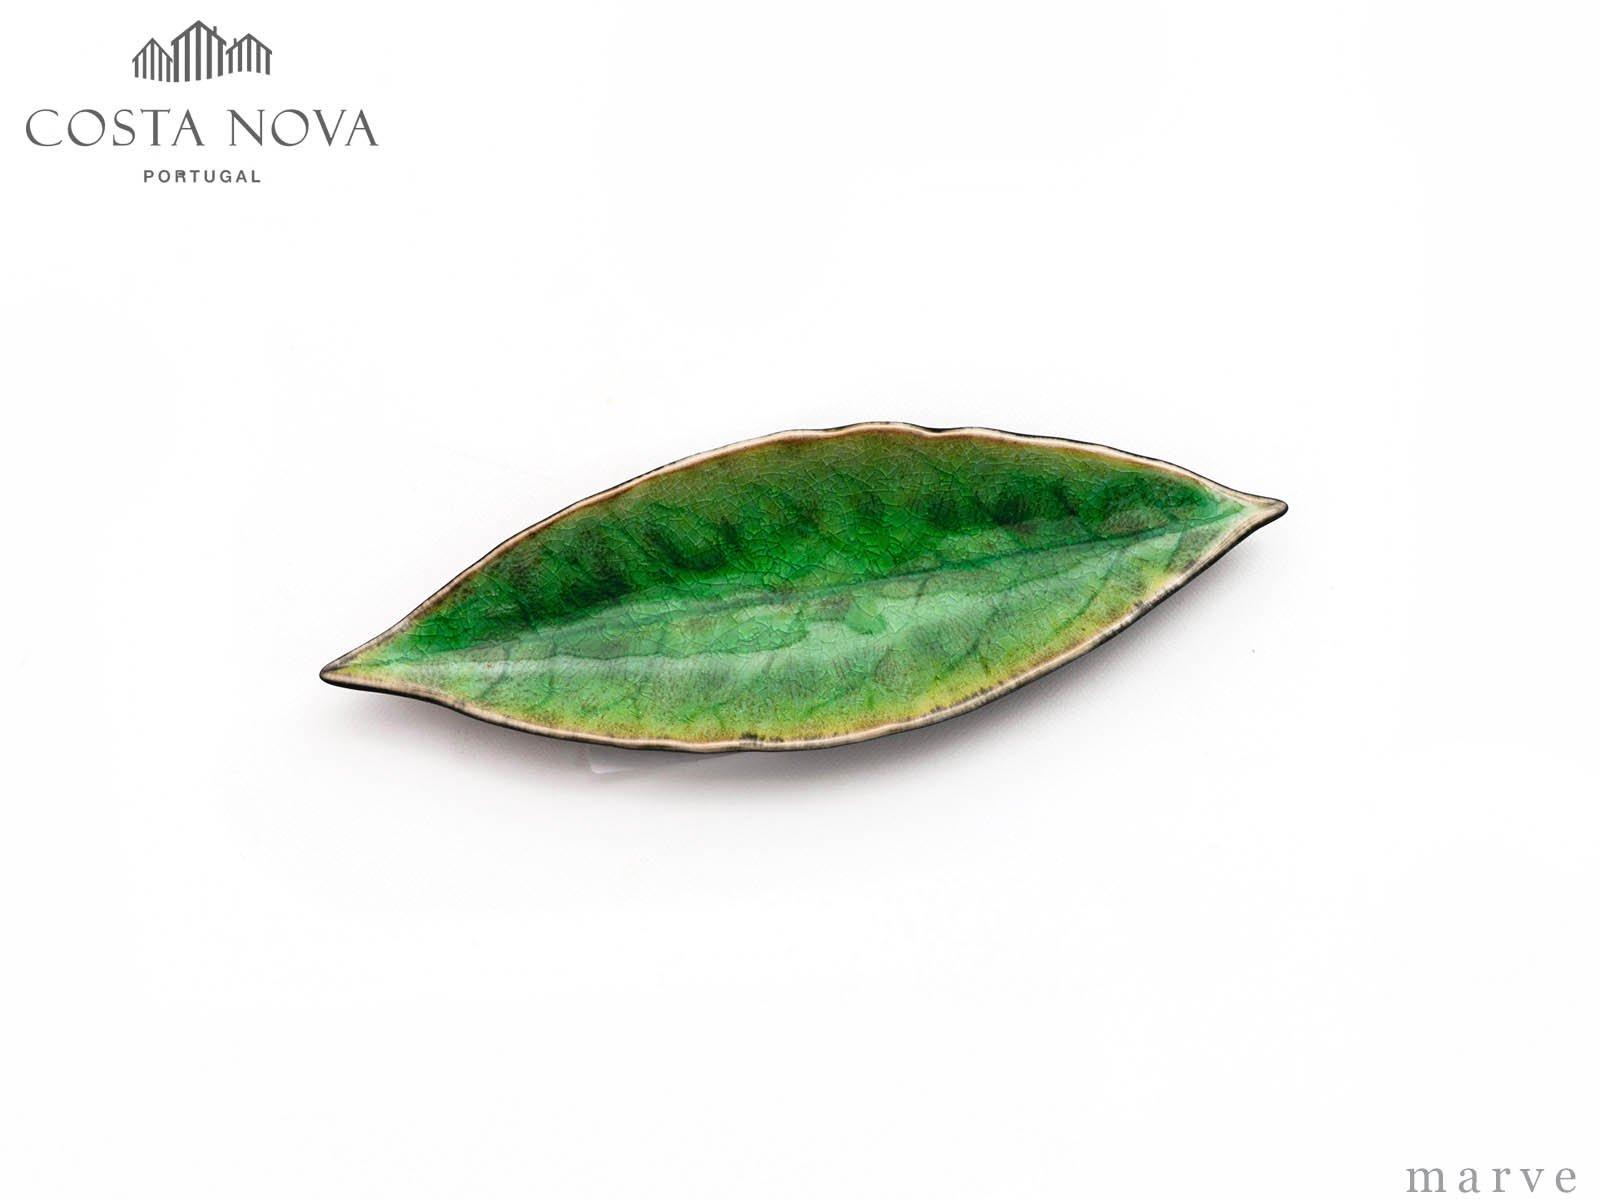 COSTA NOVA(コスタ・ノバ) RIVIERA(リビエラ)ローレルリーフ18cm トマテ